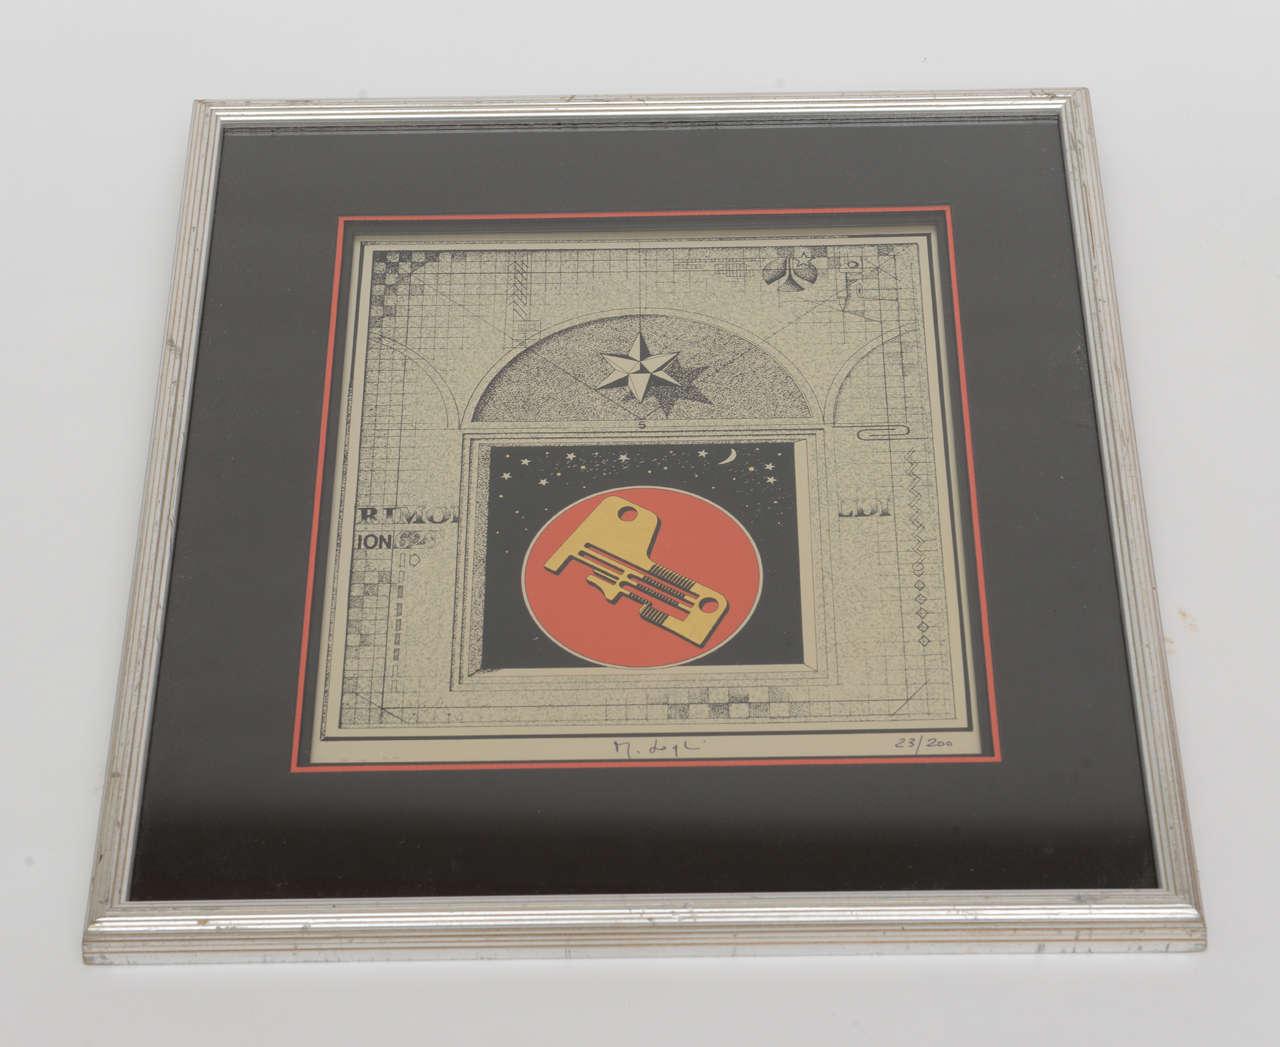 Mid-Century Modern Signed Mario Logli Red, Black, Gold Futurist Work of Art Italian Vintage For Sale